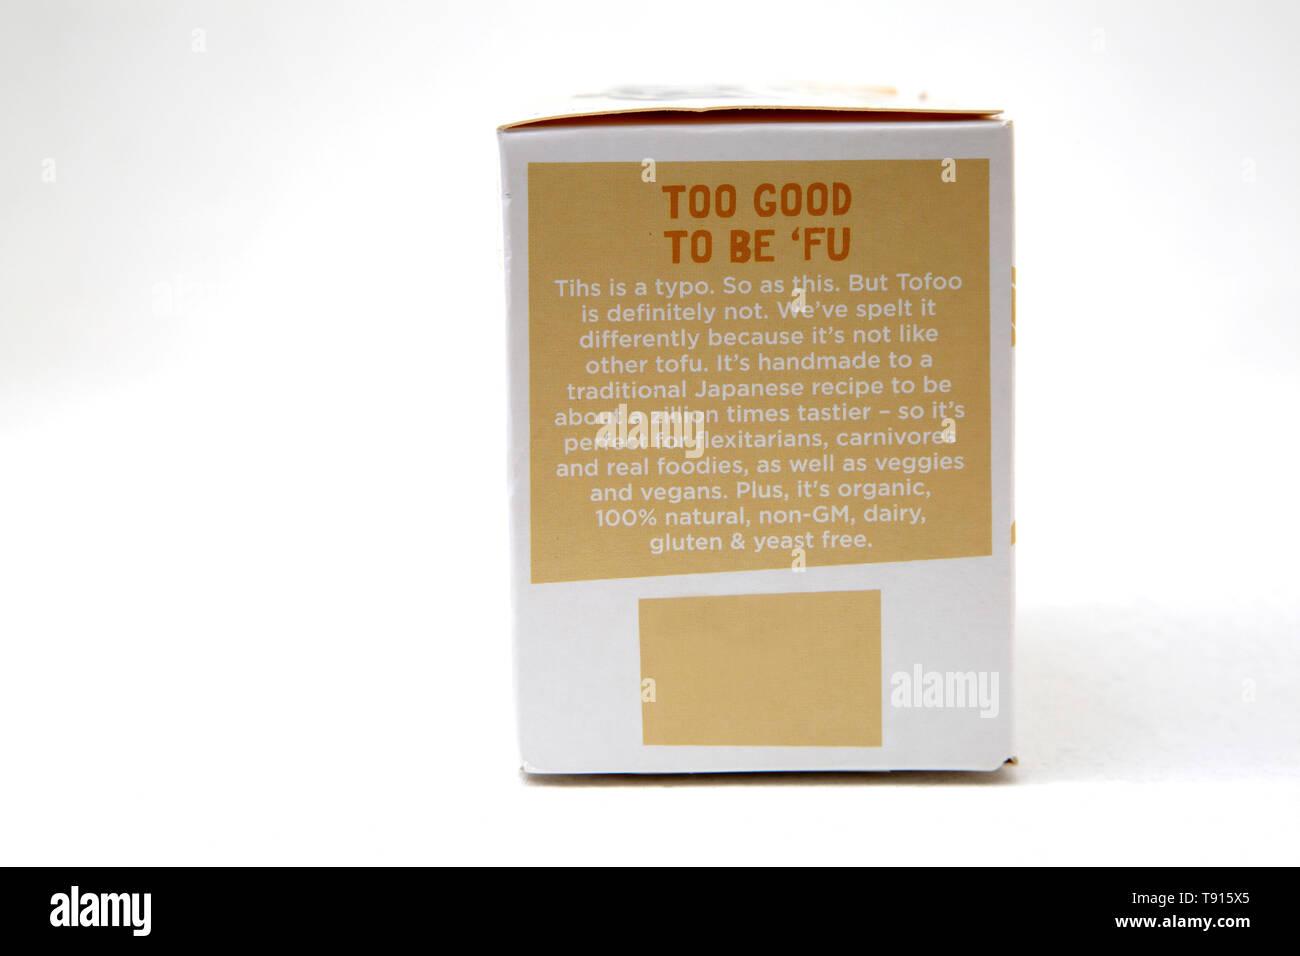 The Tofoo Co Organic Beechwood Smoked Tofu Gluten free, Dairy Free, Yeast Free non GM - Stock Image